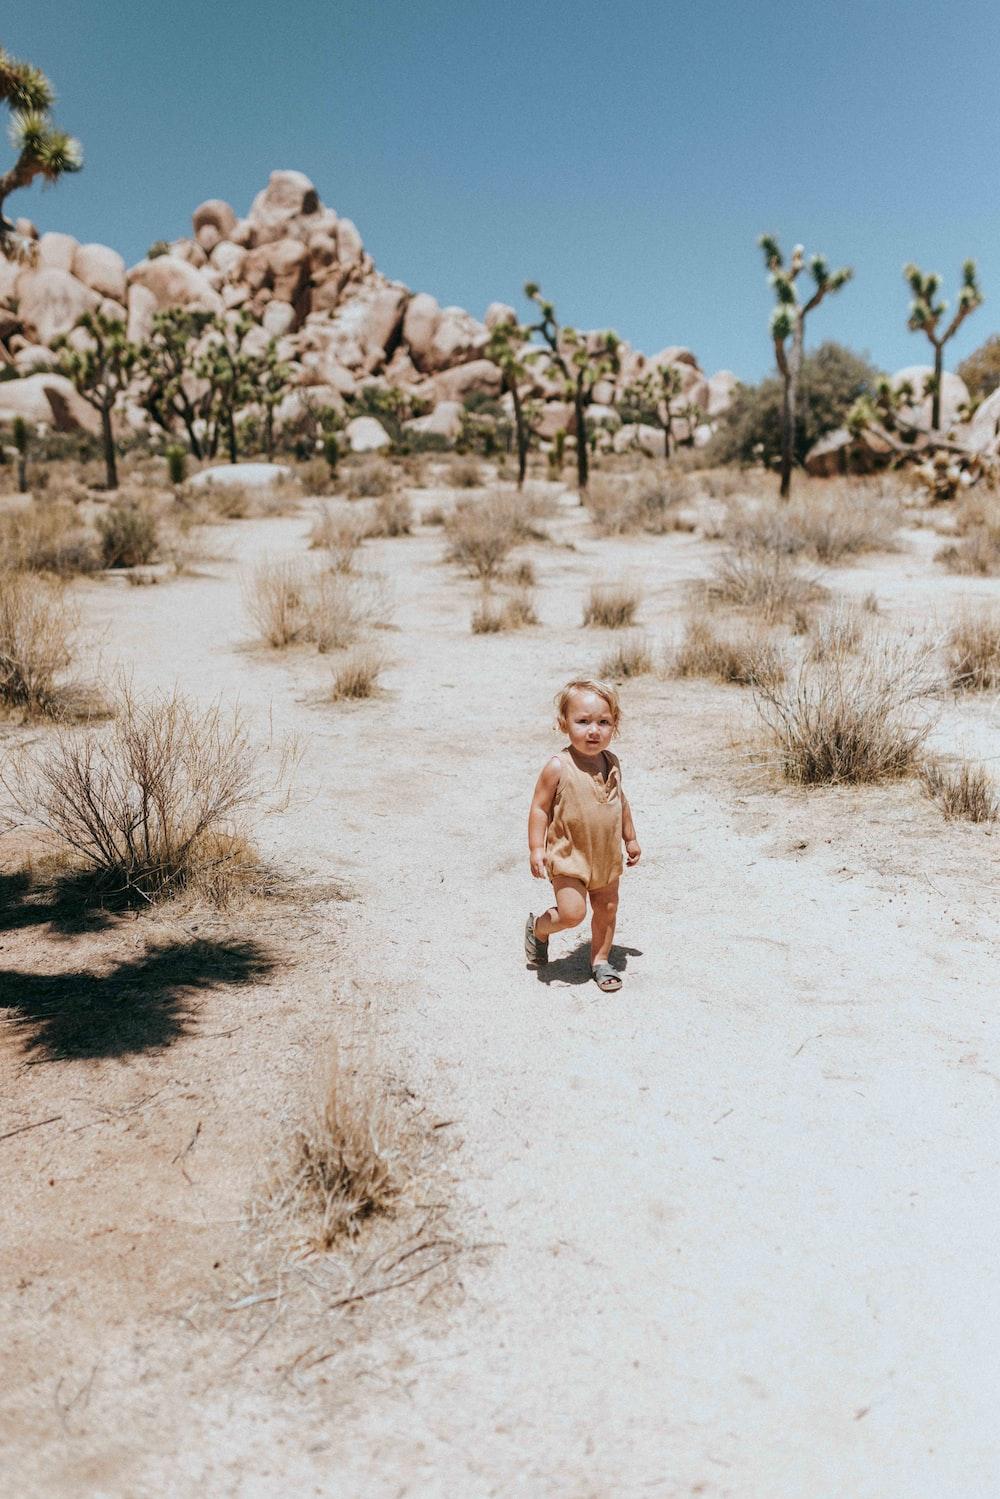 girl in brown dress running on white sand during daytime